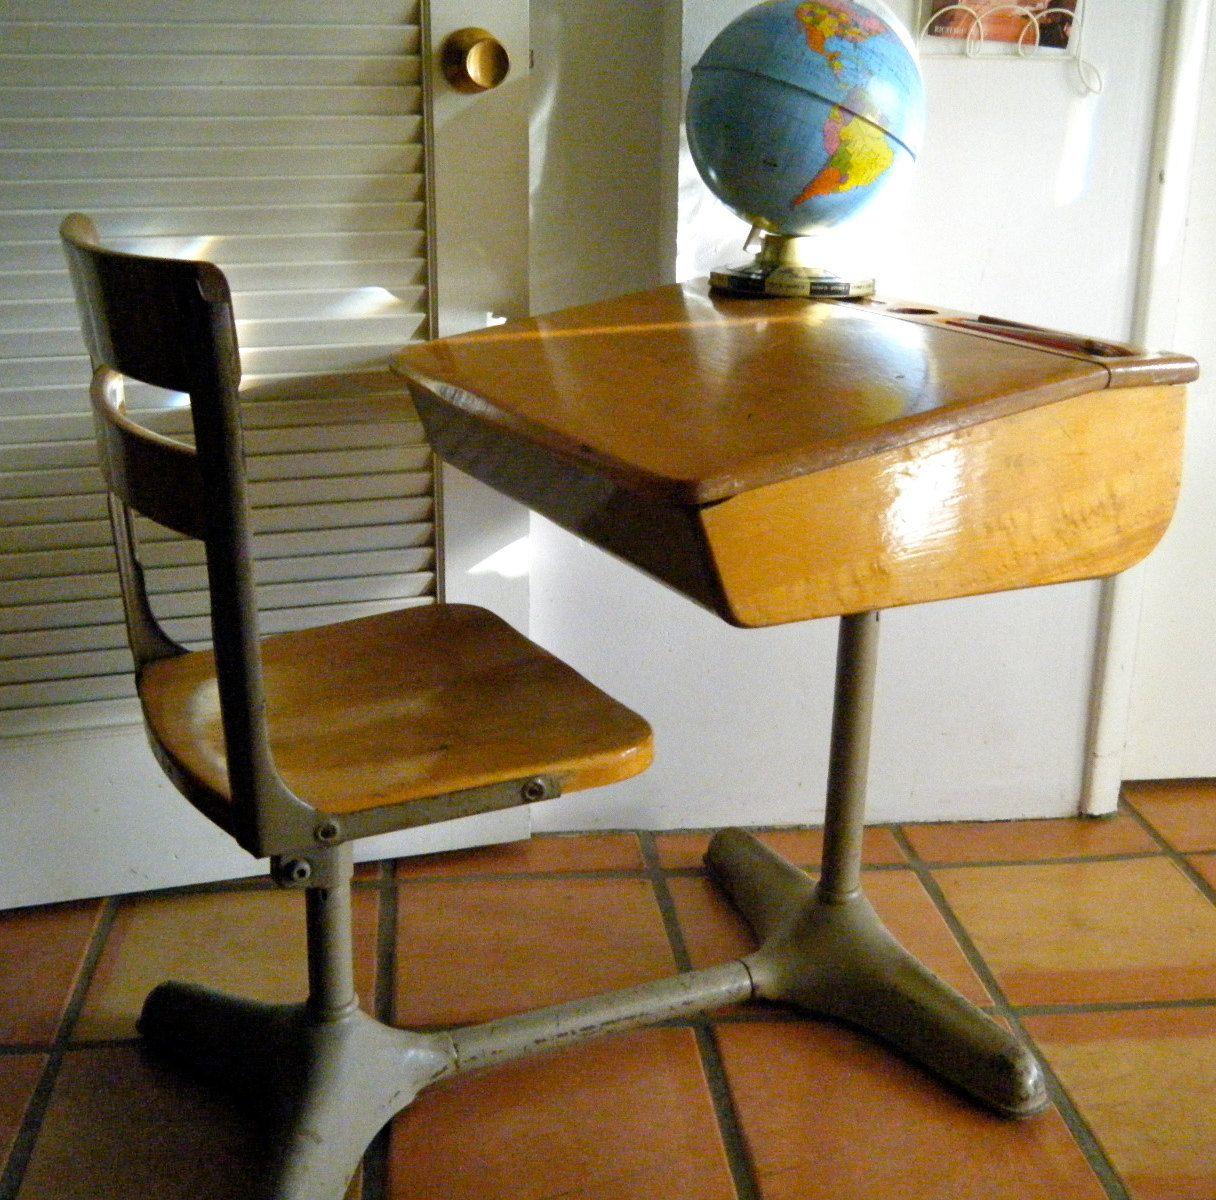 Back to School Sale- Vintage Child's Wooden School Desk with Flip Top Lid,  Wood and Industrial Steel Construction - Vintage Child's Wooden School Desk With Flip Top Lid, Wood And